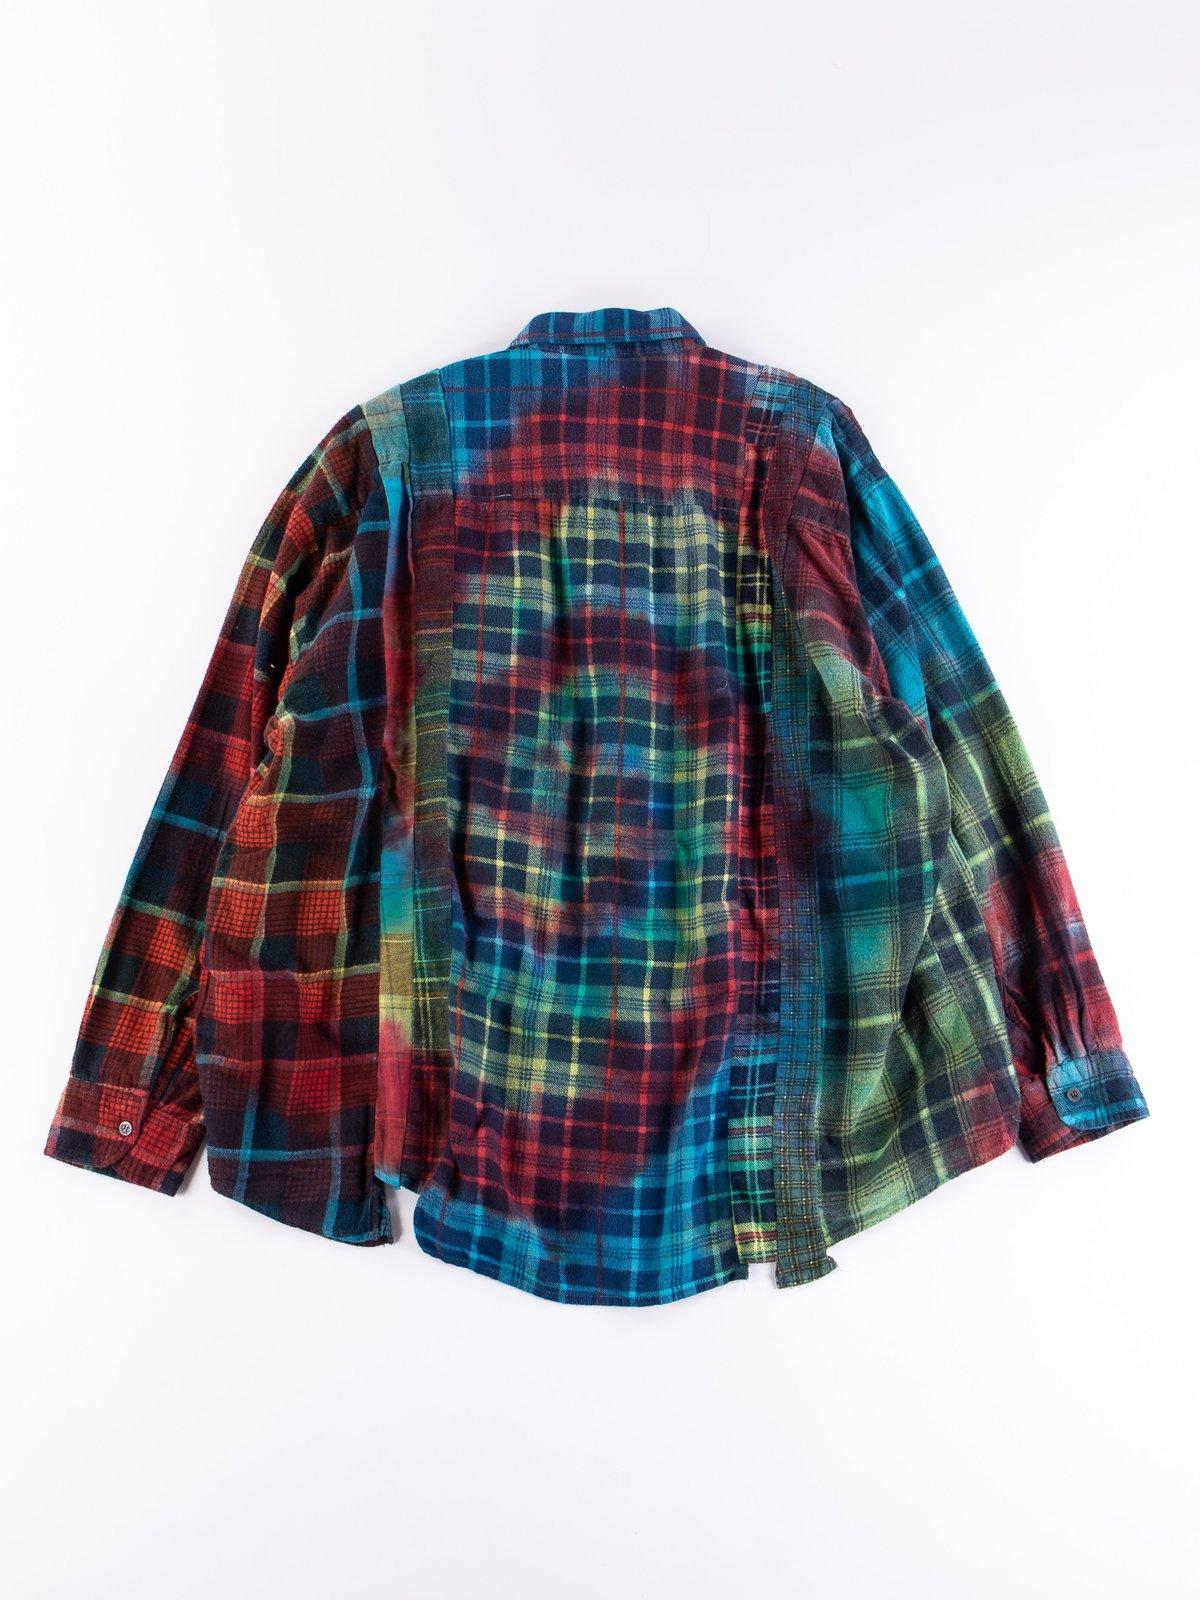 Tie Dye Assorted 7 Cuts Rebuild Shirt - Image 6